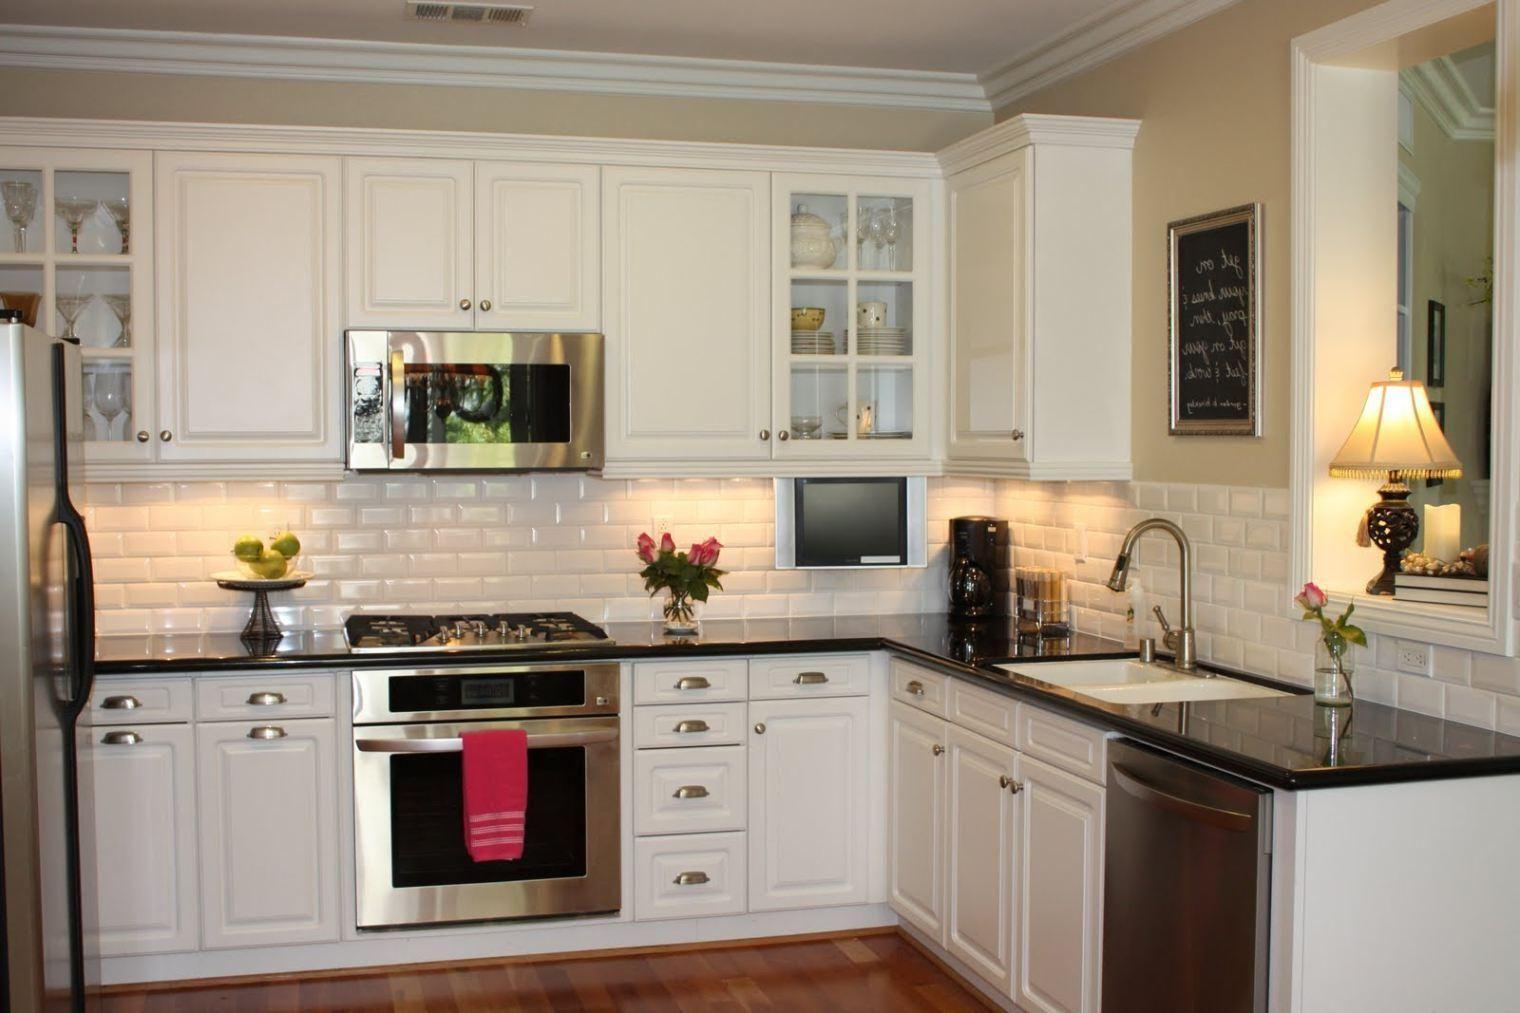 43 inspiring white kitchen cabinets with dark floors